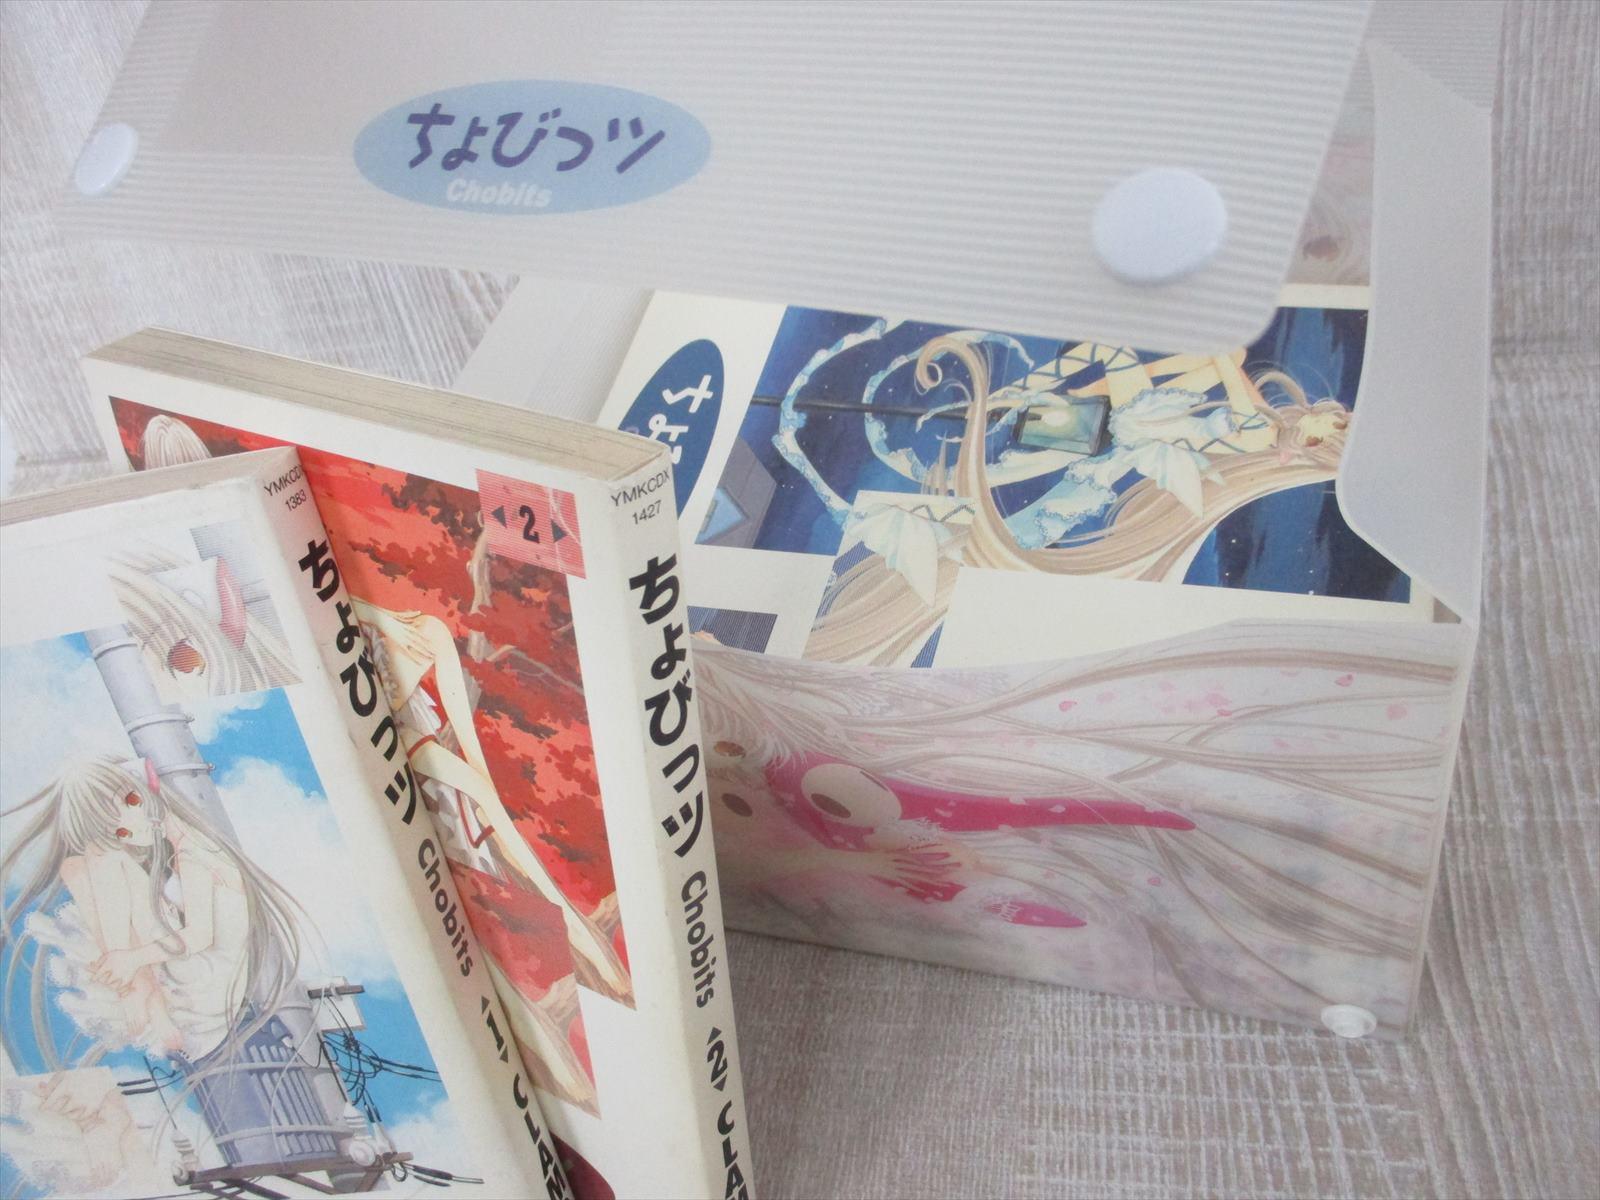 CHOBITS Manga Comic Complete Set 1-8 in Ltd Case CLAMP 2002 Book KO*